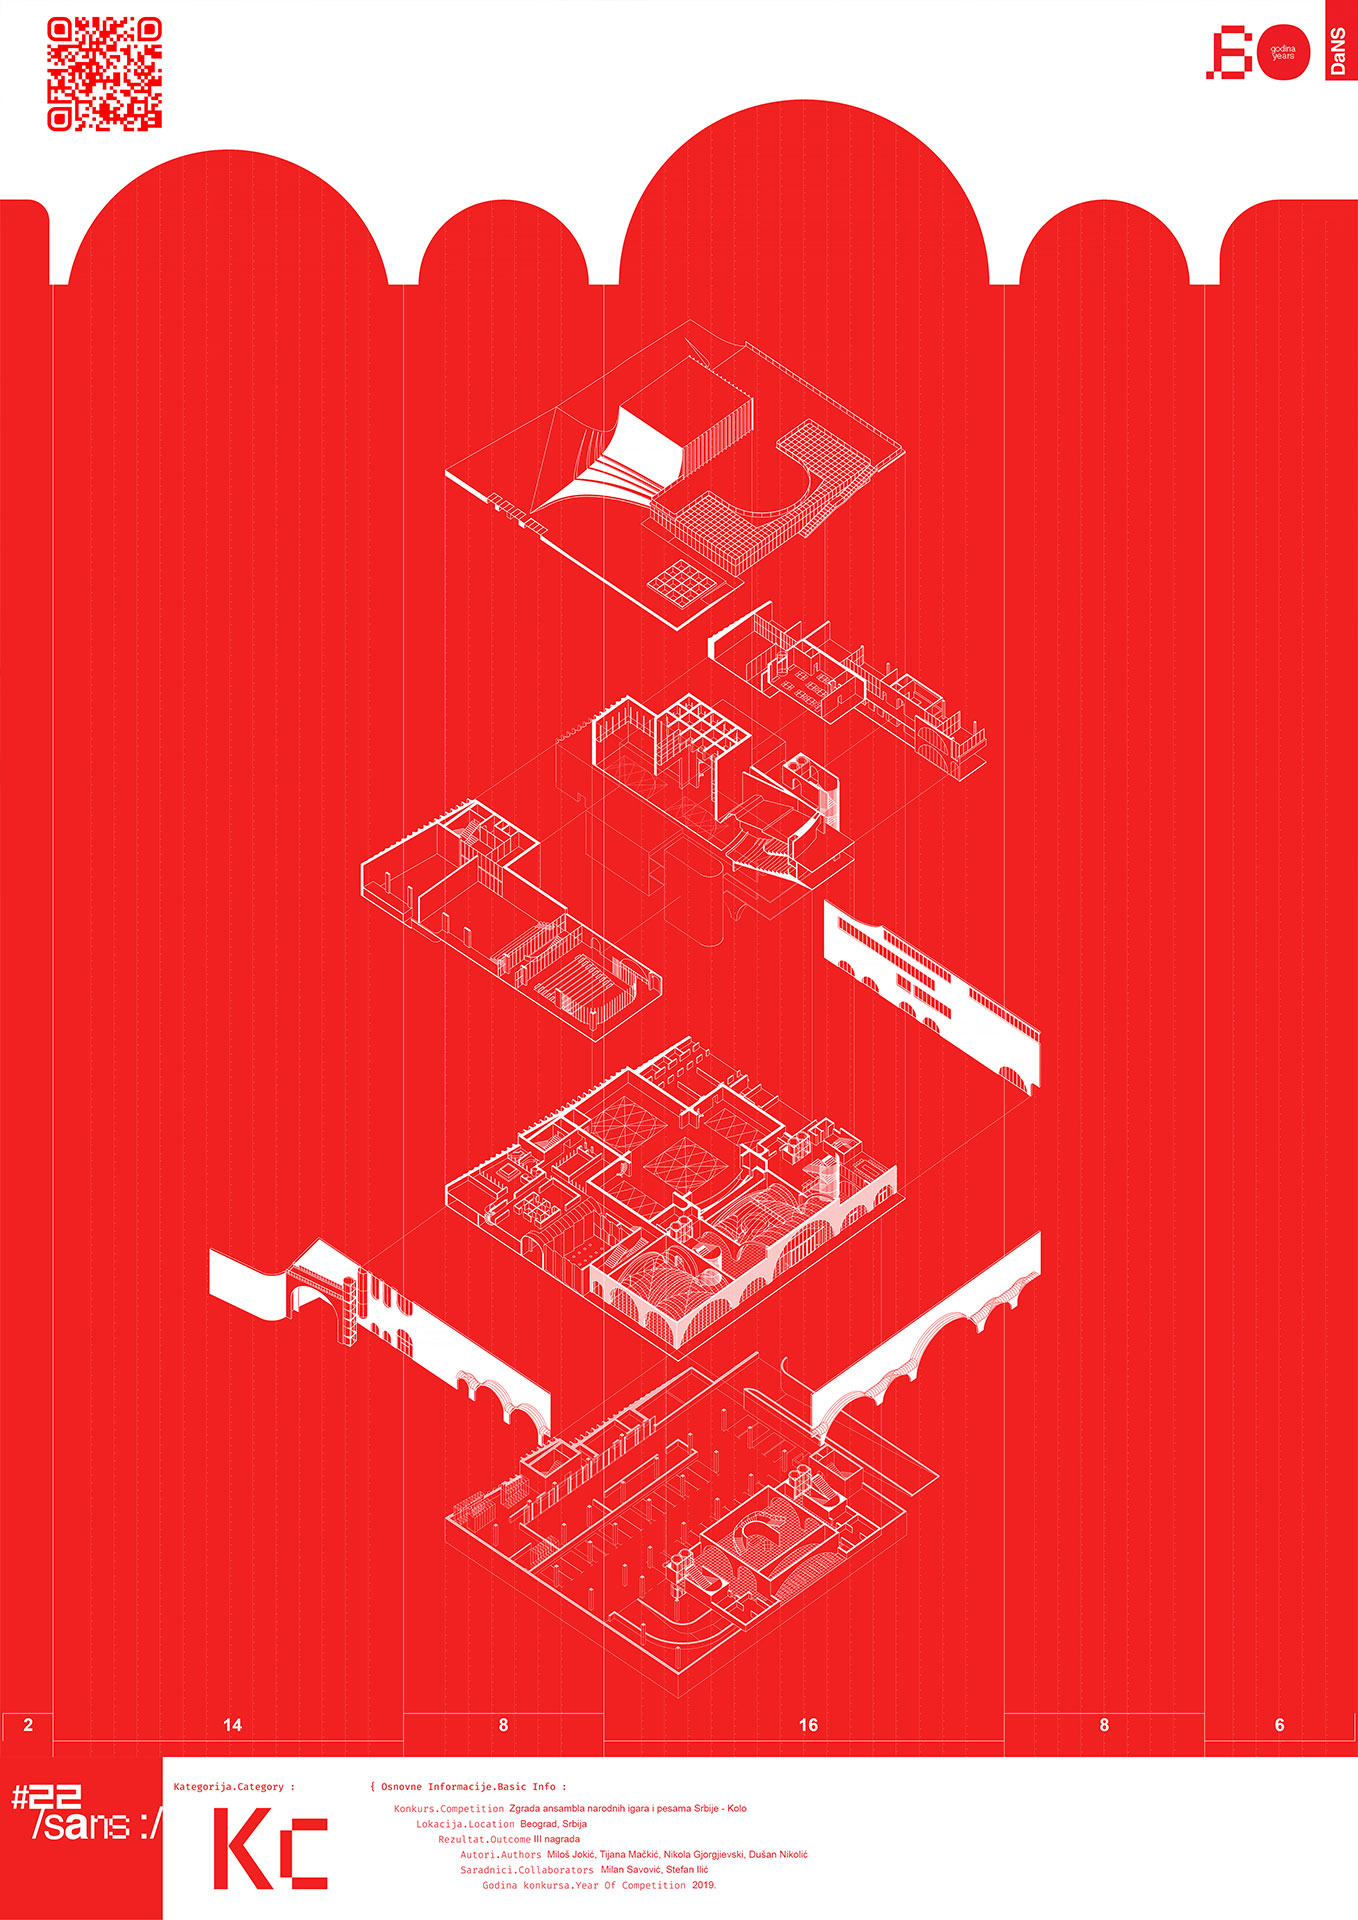 "<p class=""naslov-br"">kc07</p>Zgrada ansambla narodnih igara i pesama Srbije - Kolo ; Otvoreni javni konkurs - 3. nagrada // Kolo National Ensemble Building; Open Public Call - 3rd Prize"